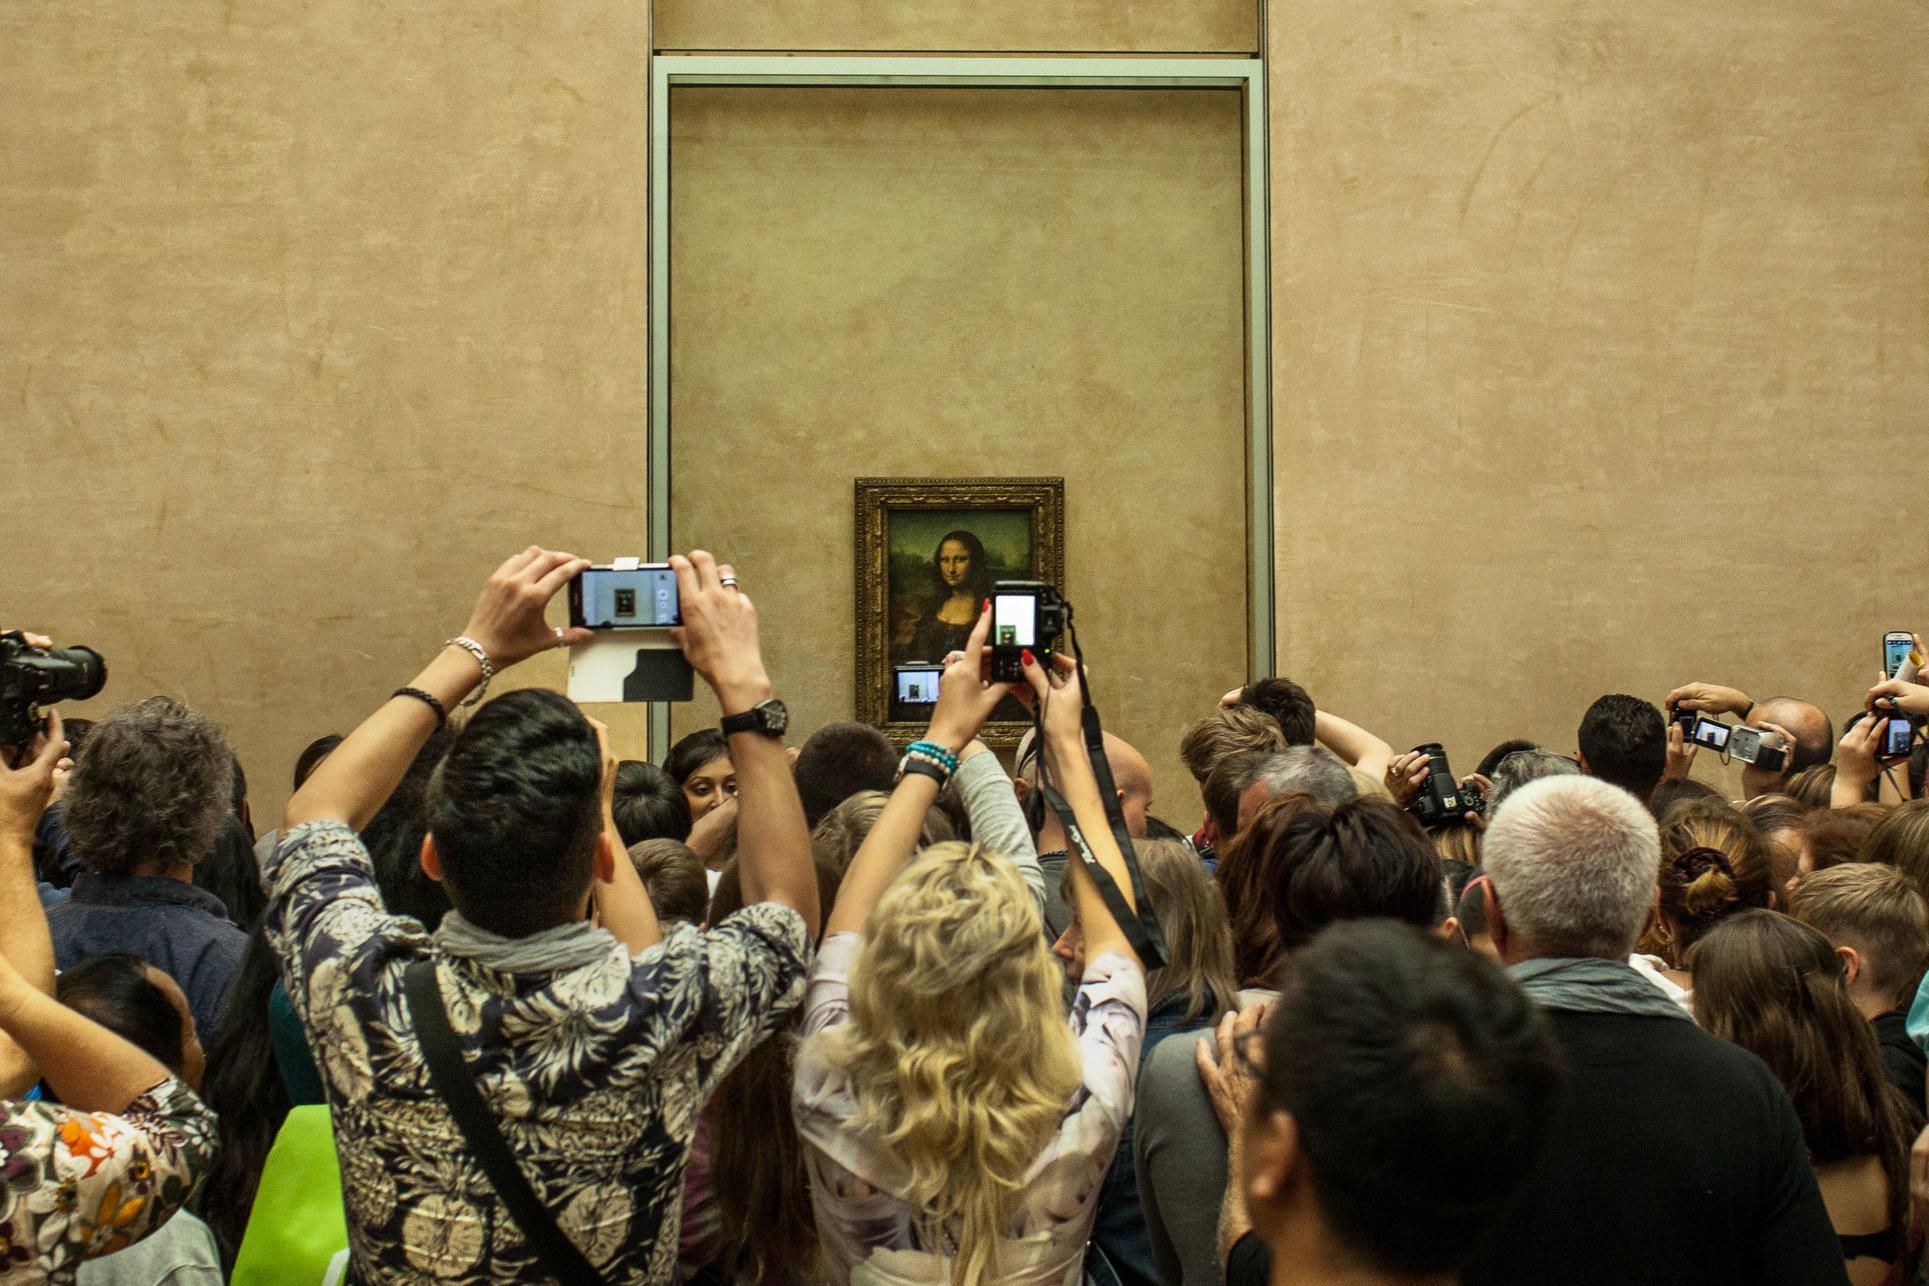 Crowd Mona Lisa Museum